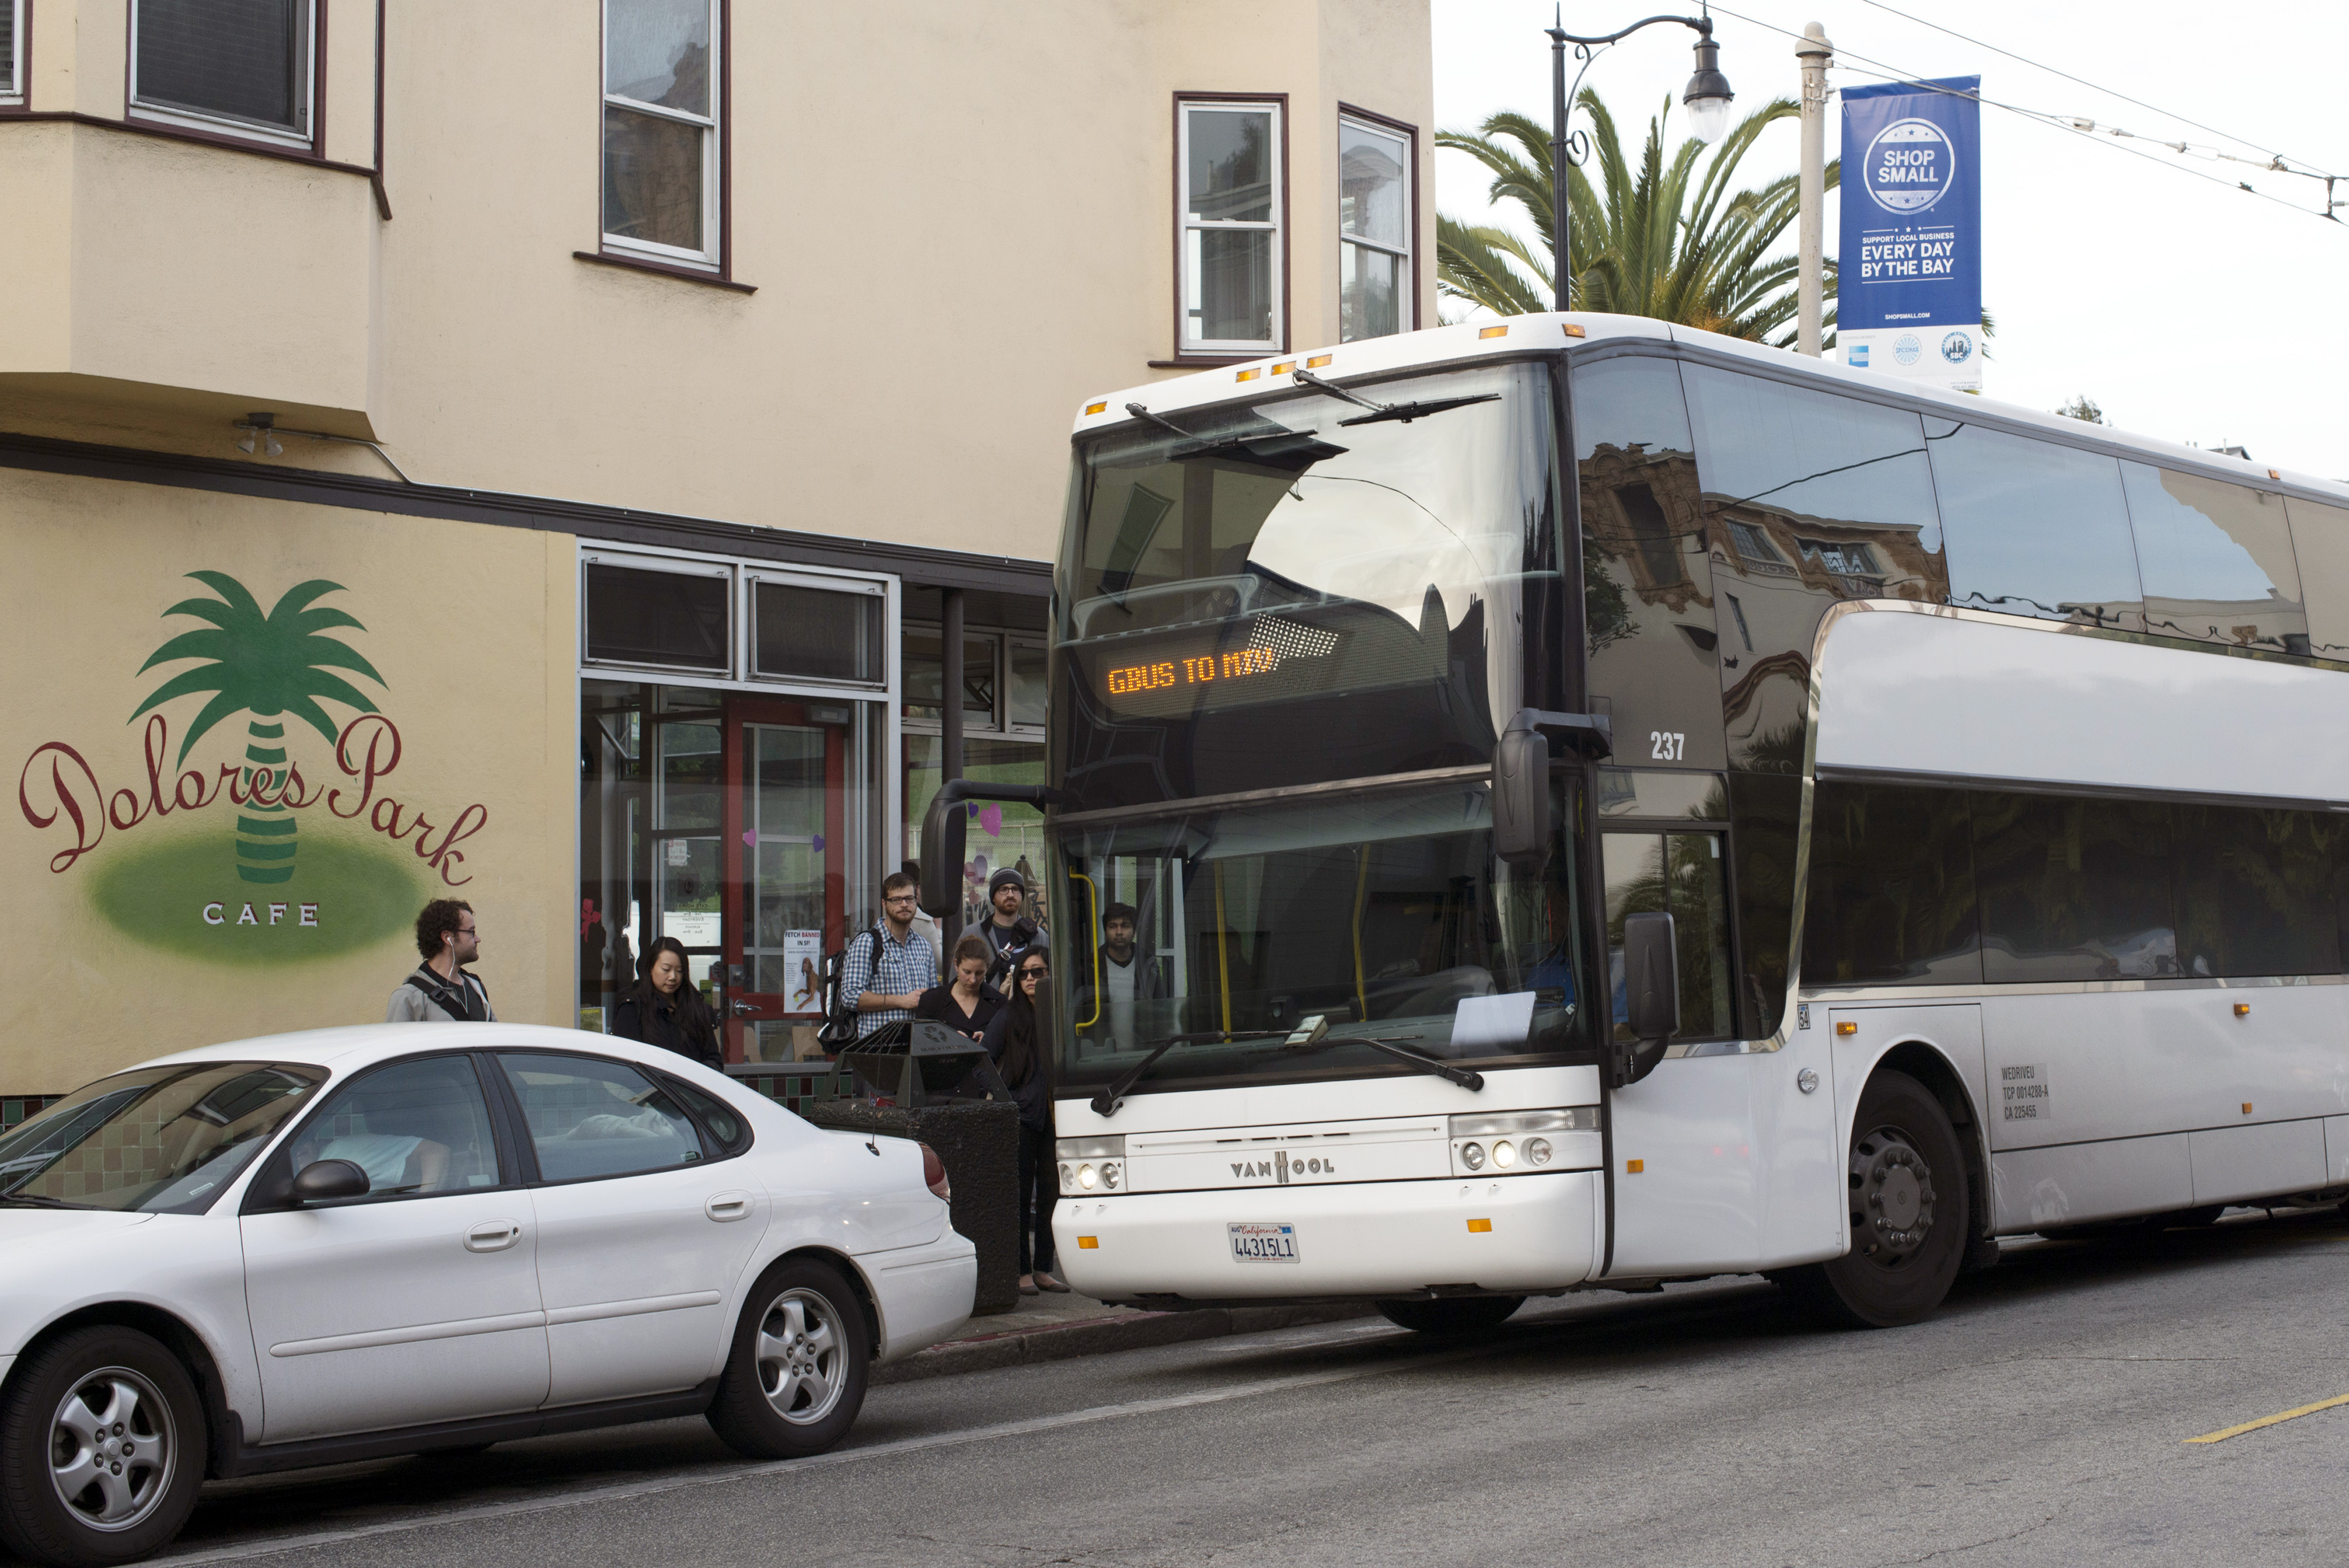 Google Buses Fuel Inequality Debate as Boom Inflates Rents